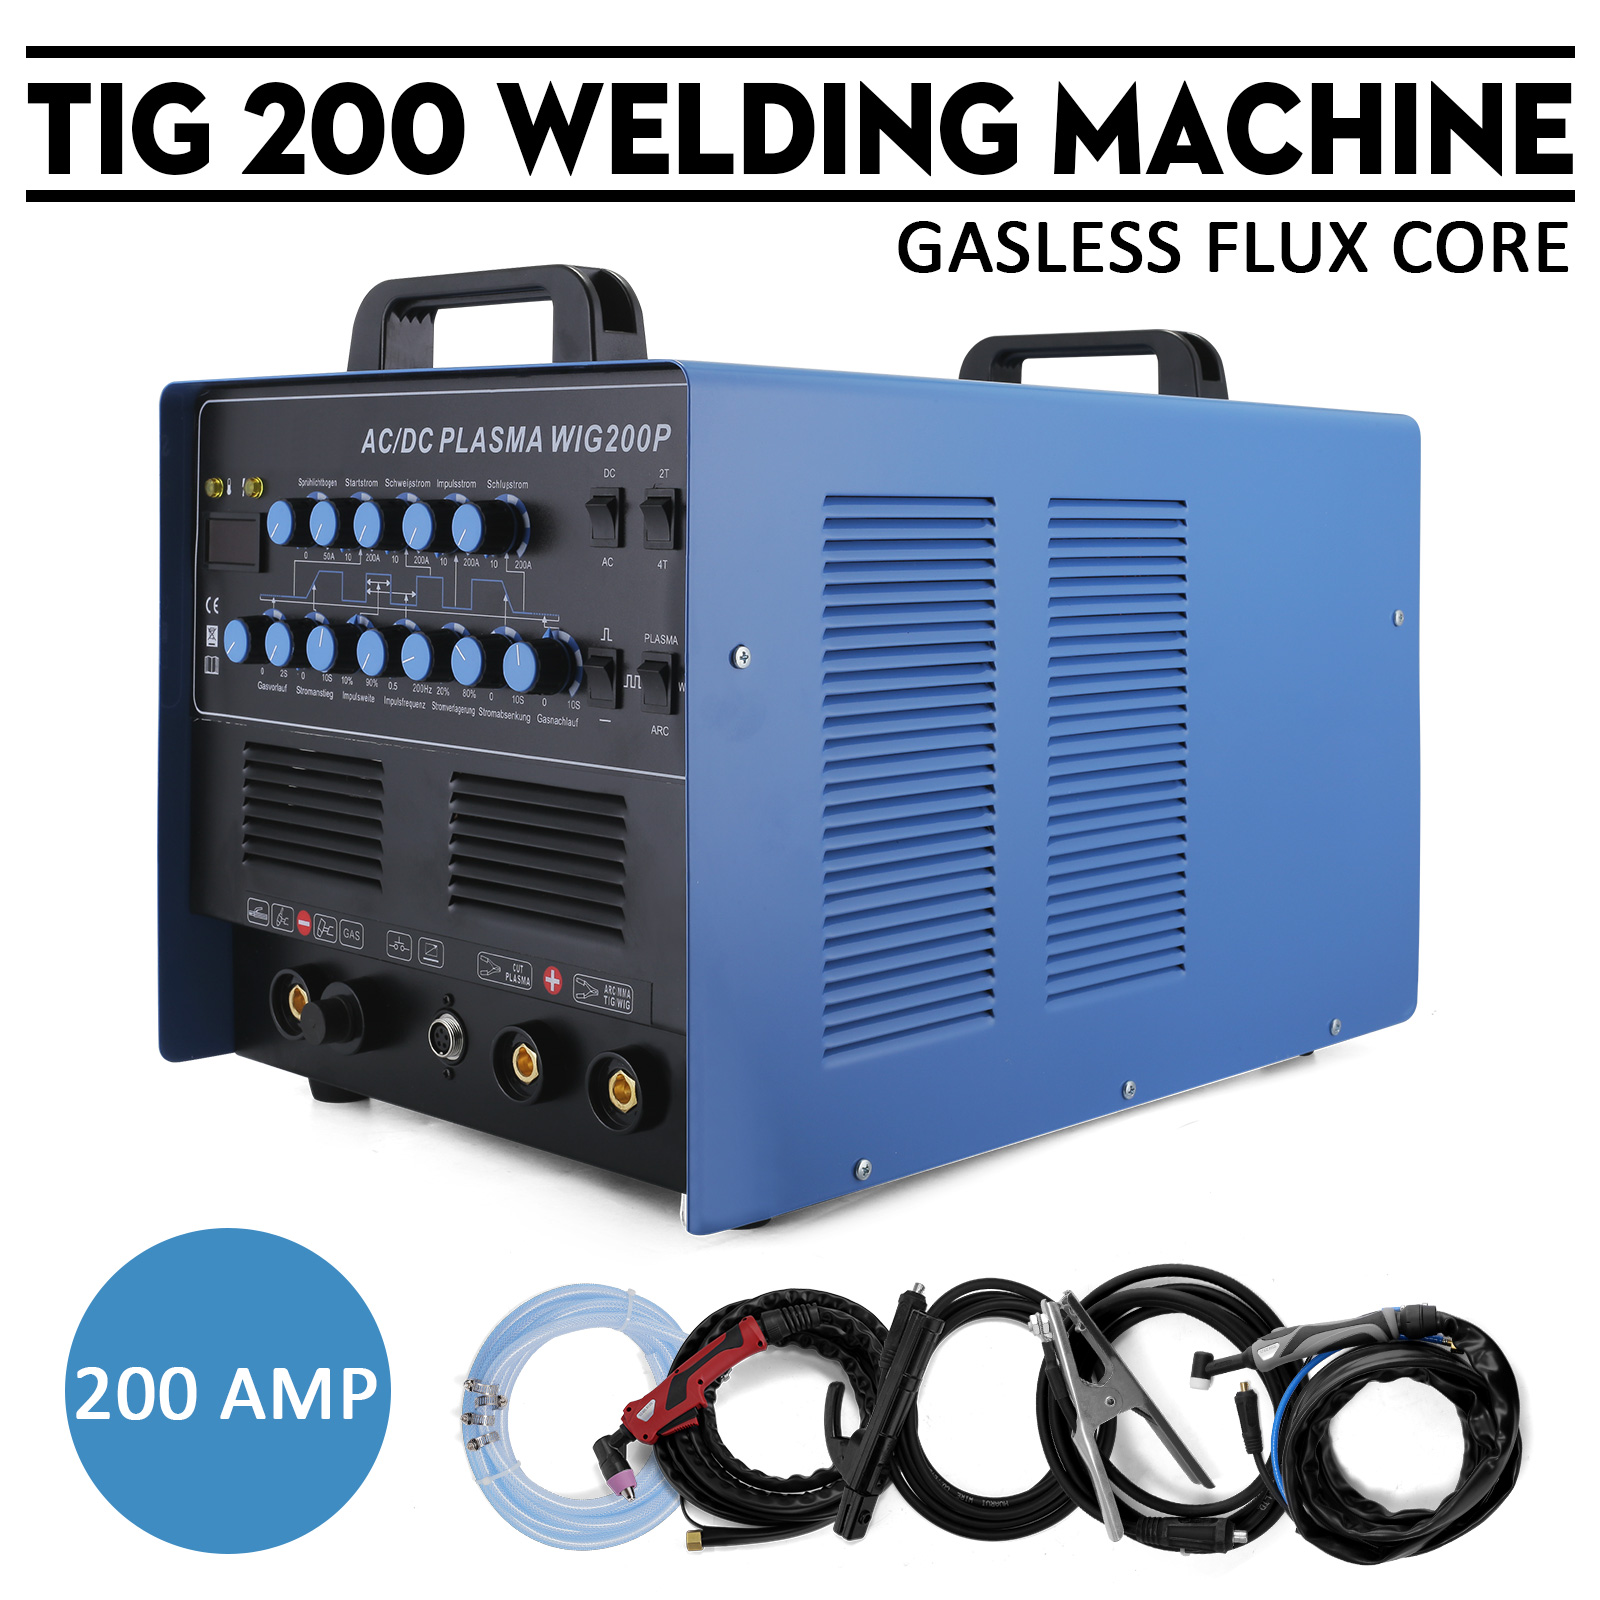 WELDER AC DC Tig 200 amp Welding Weld Kits Device Machine Pulse ...